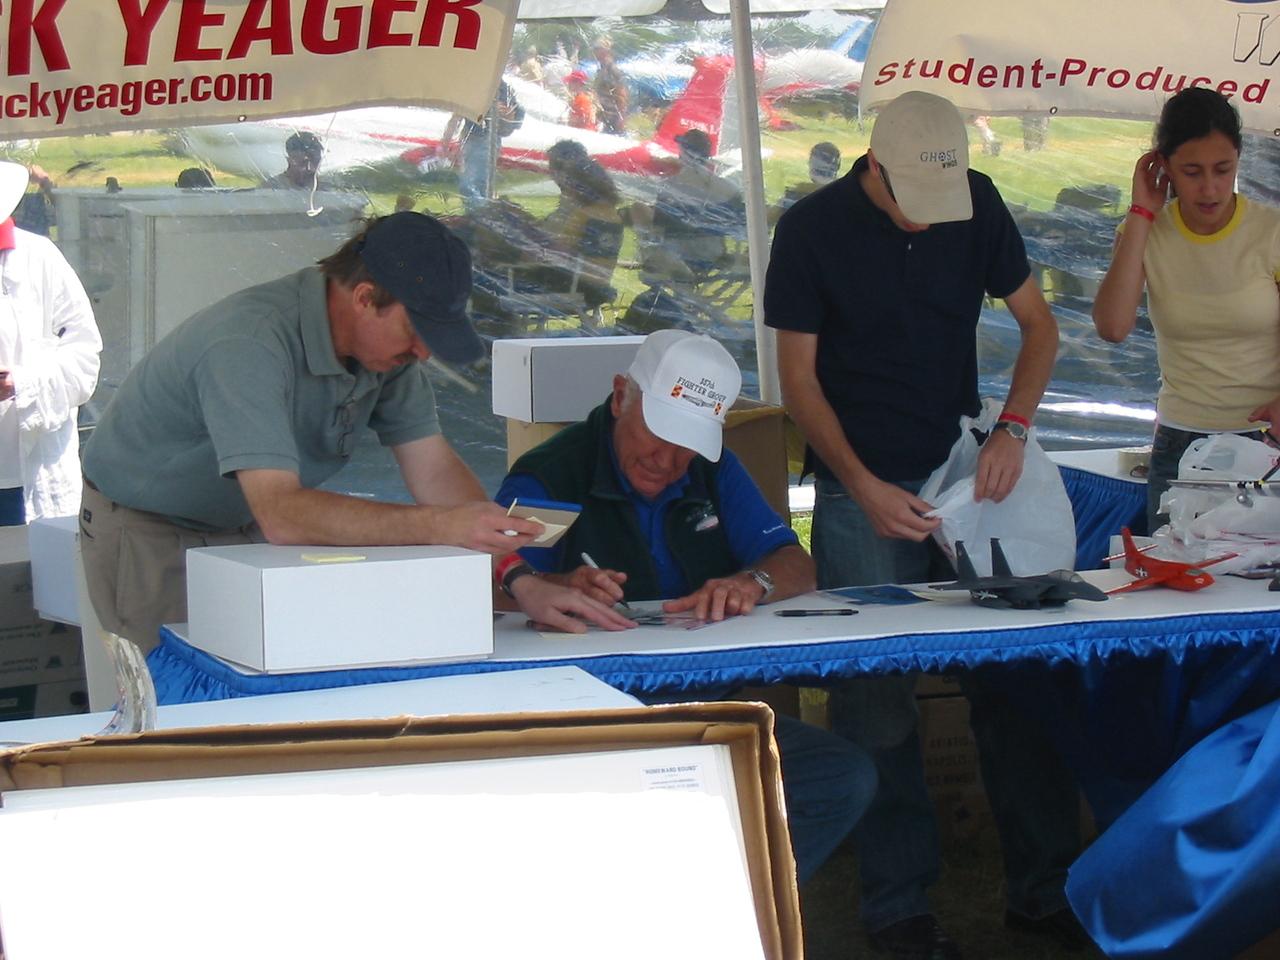 You want Chuck's autograph?  Twenty bucks.  It's for a charity, but still....